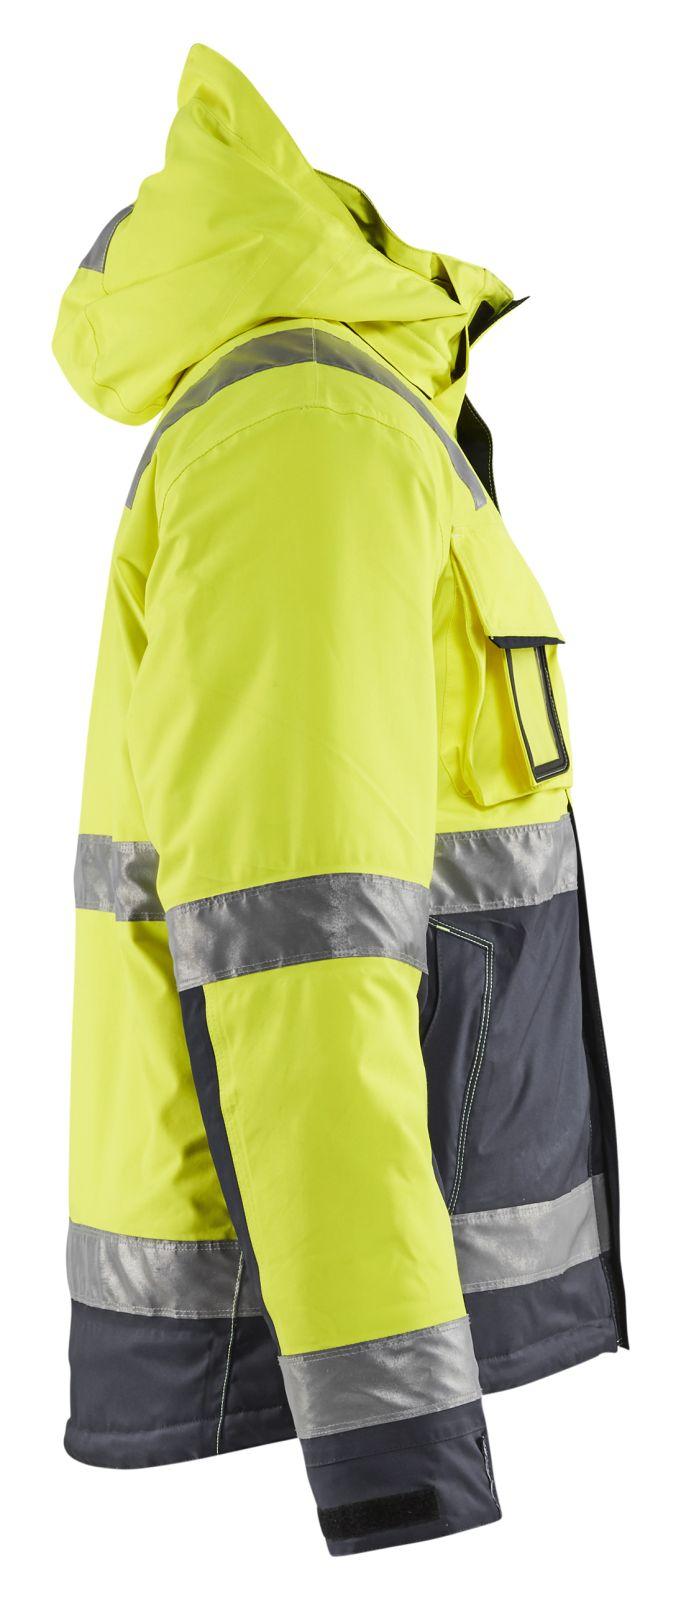 Blaklader Jassen 48701987 High Vis fluo geel-middelgrijs(3396)